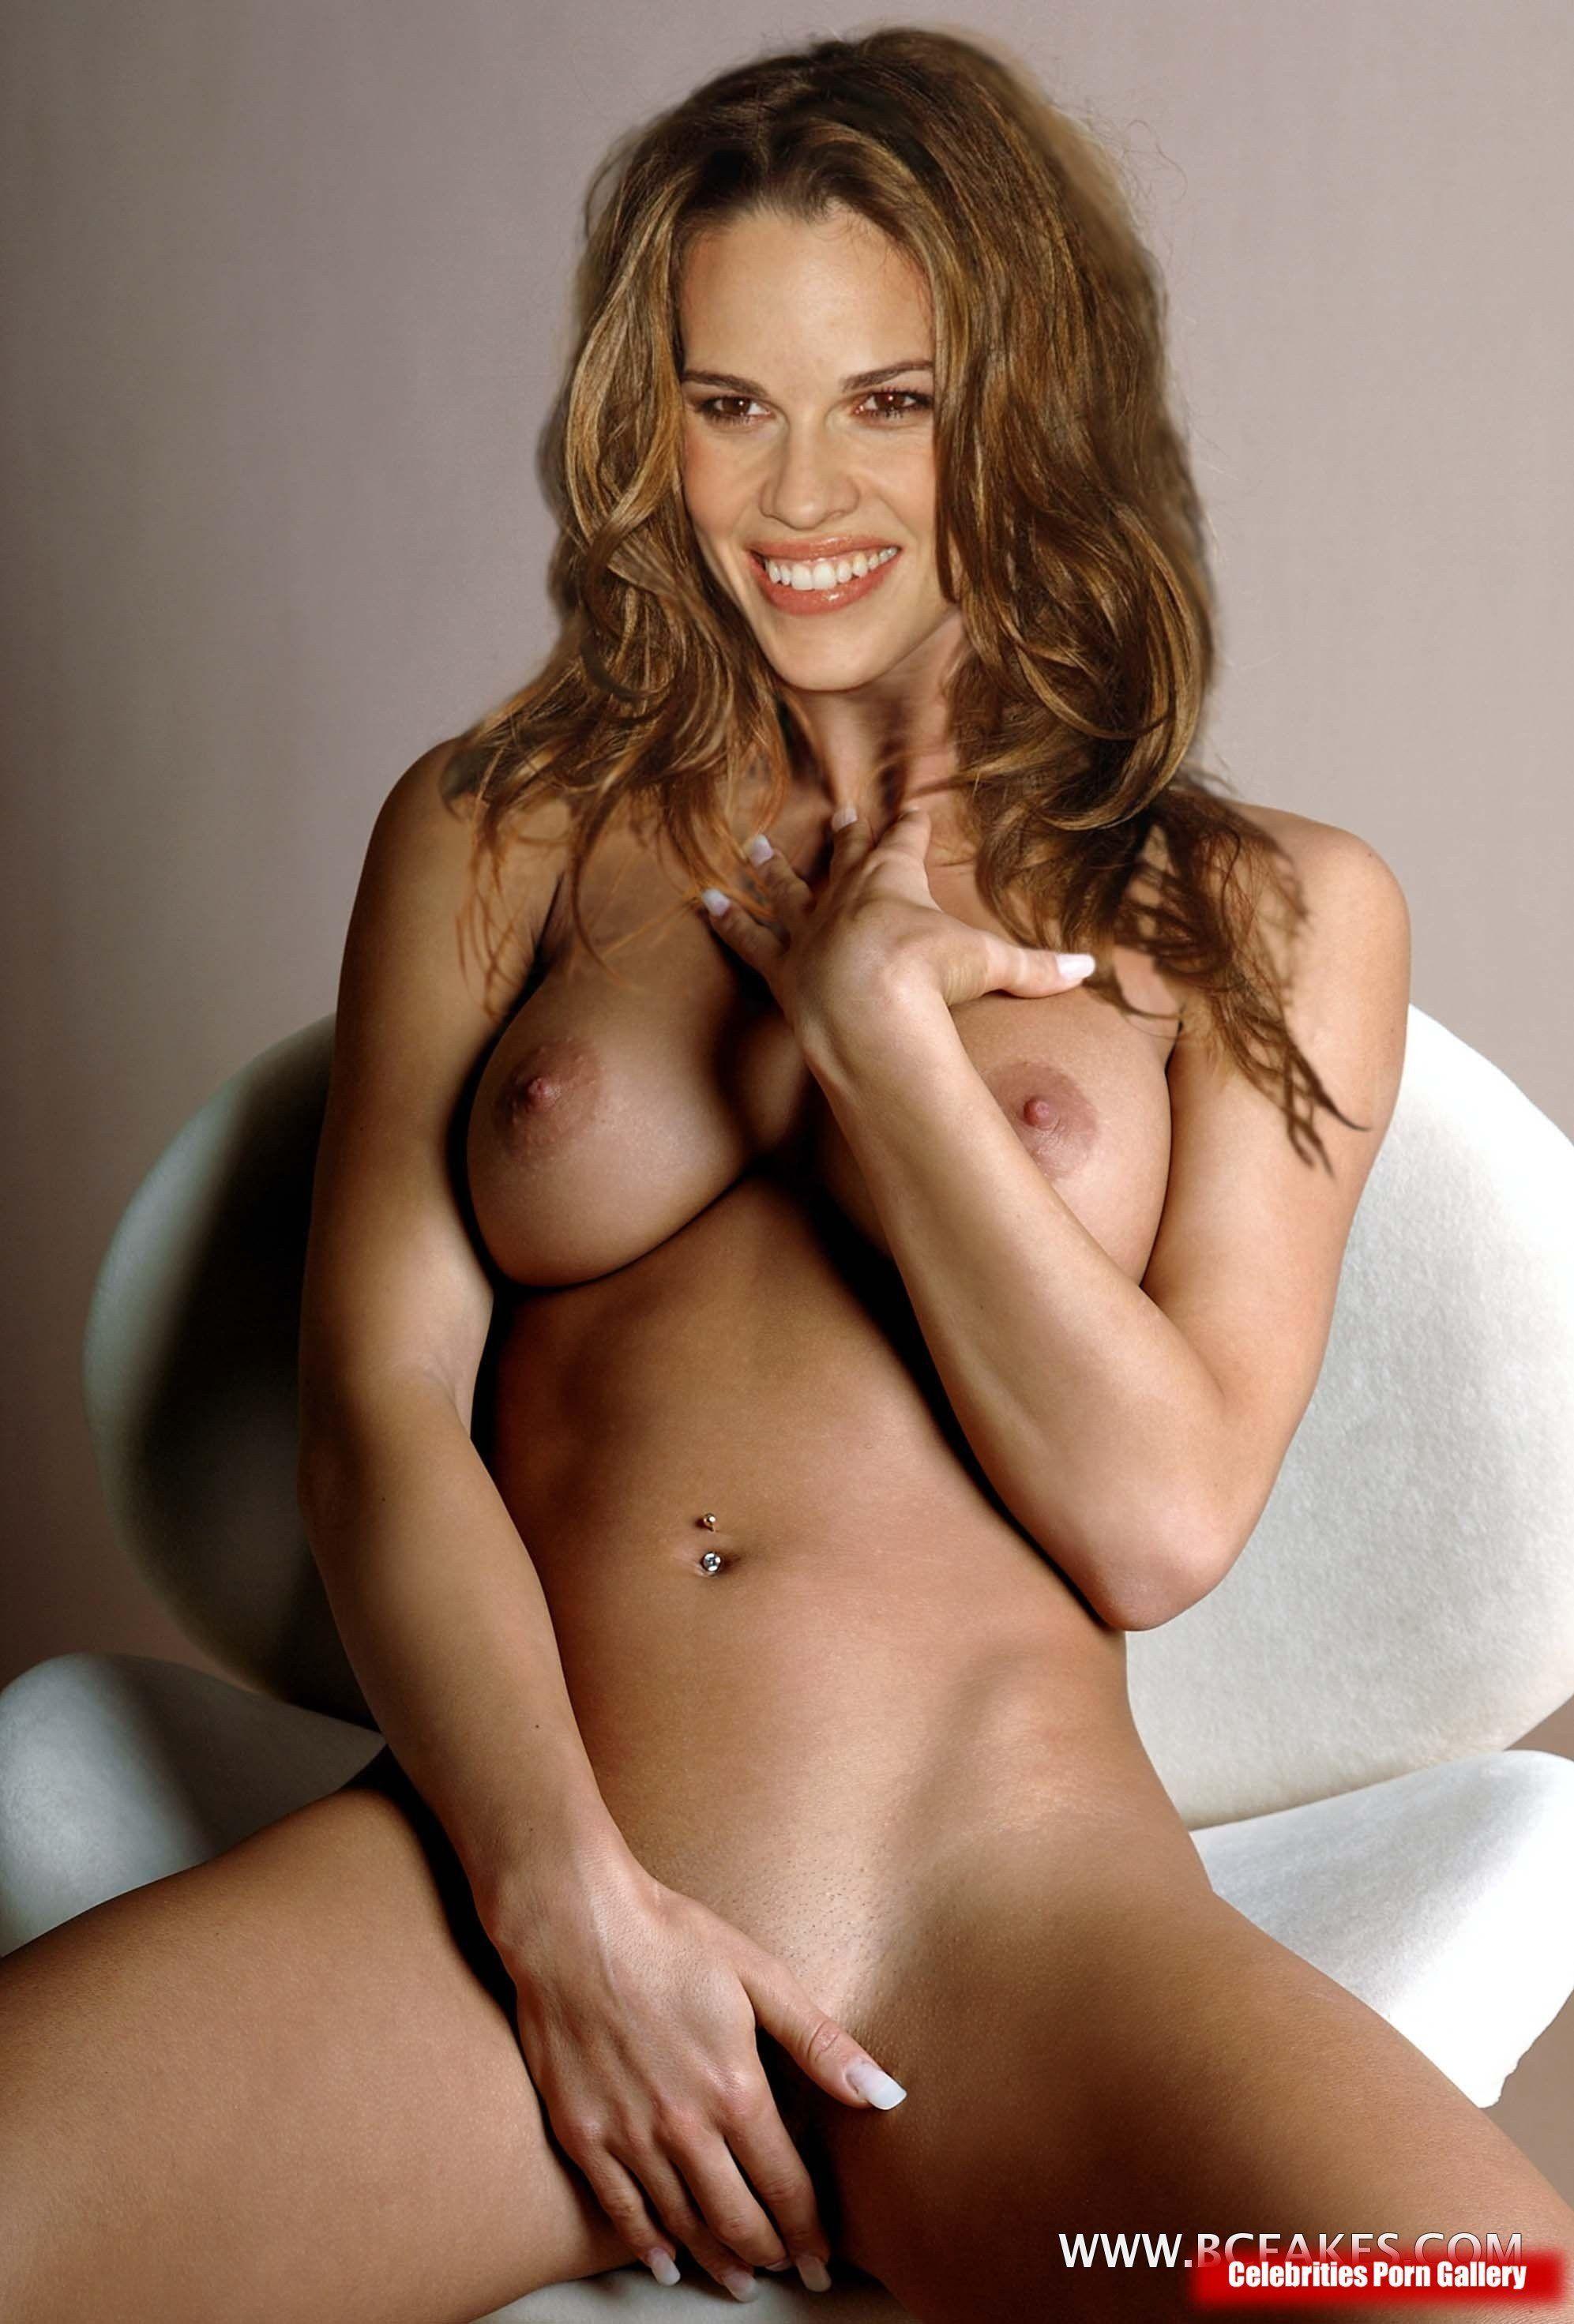 best of Swank fakes Hilary naked